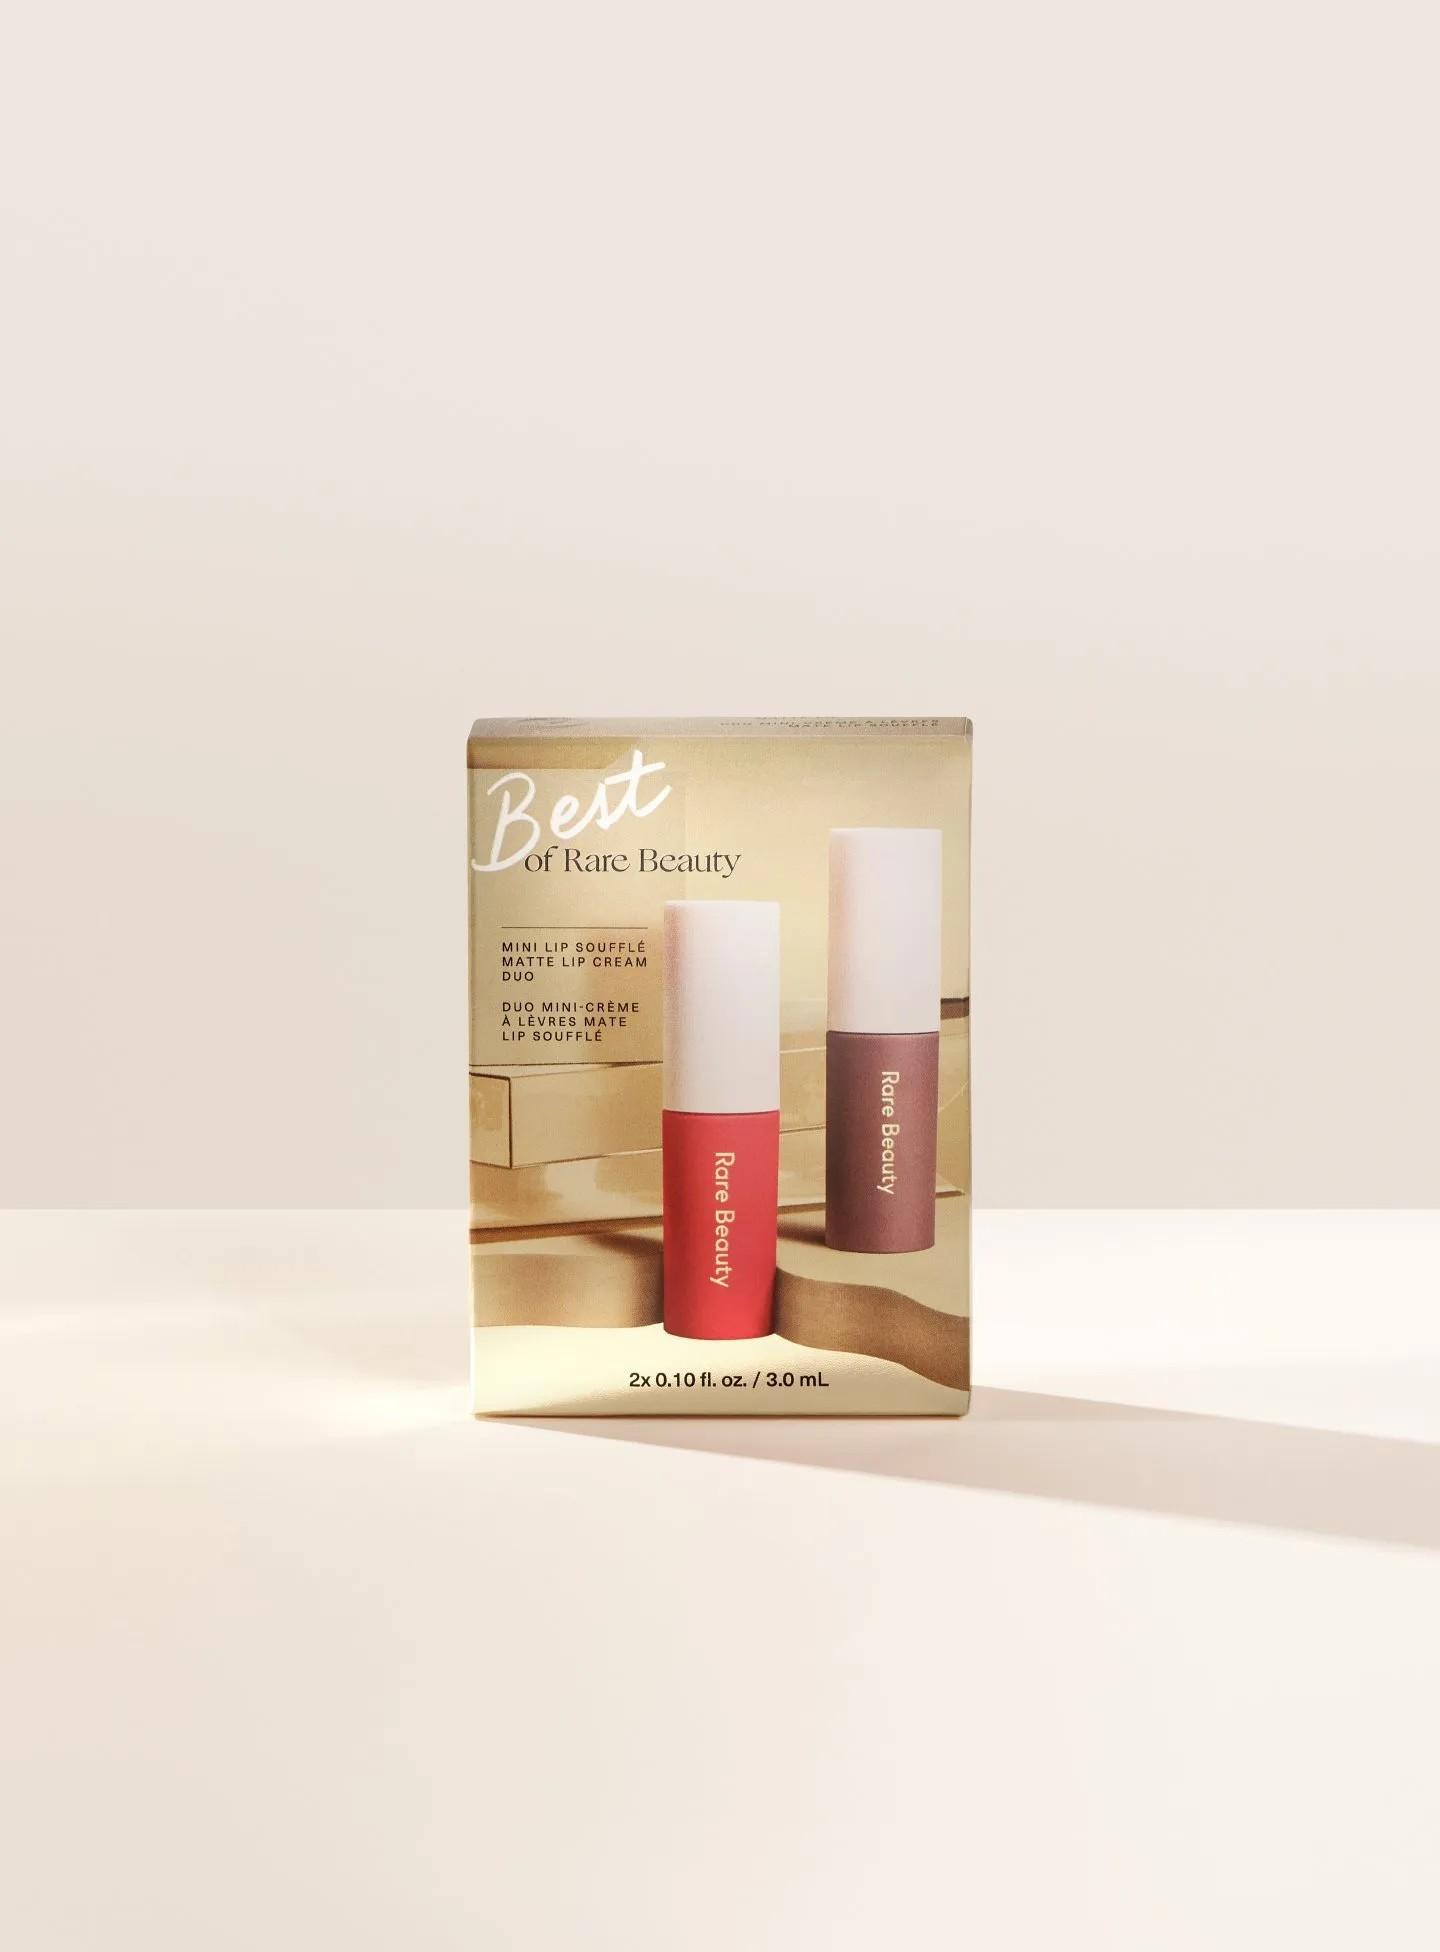 Kit Mini Lip Soufflé Matte Lip Cream Duo - Rare Beauty